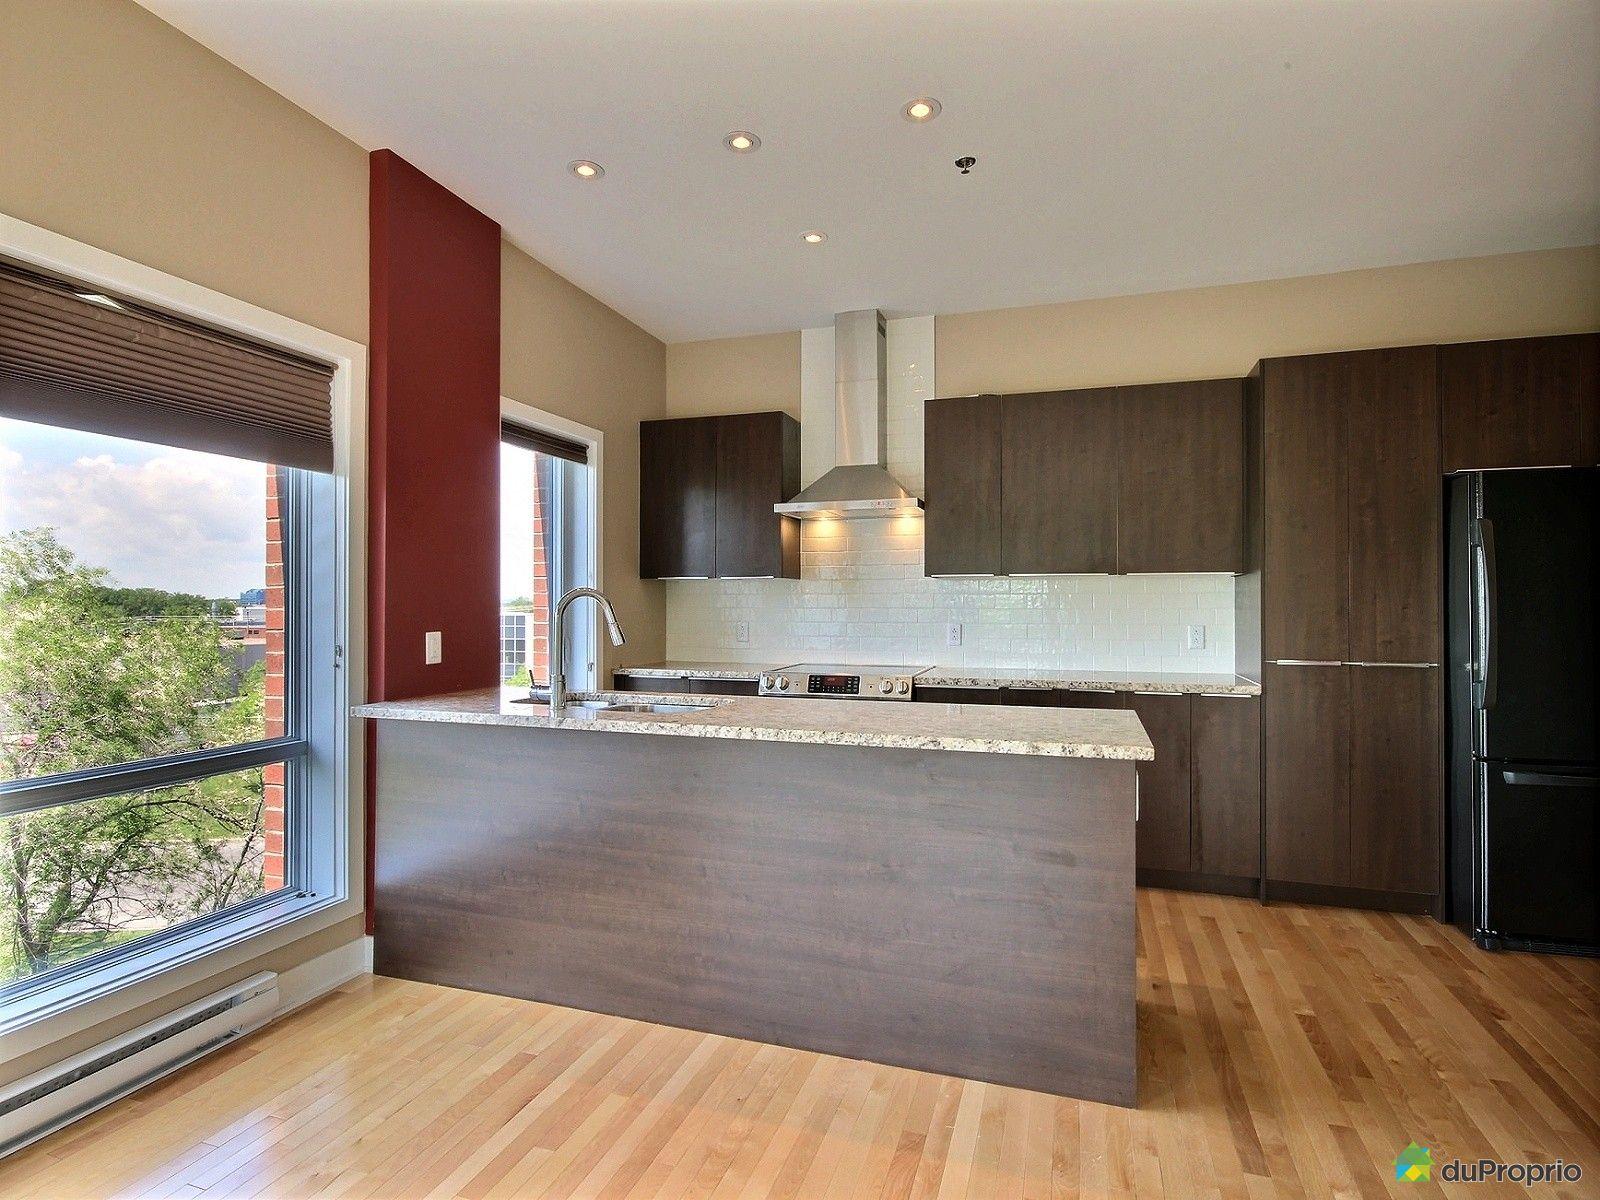 Condo vendu montr al immobilier qu bec duproprio 616327 for Ares cuisine pointe claire